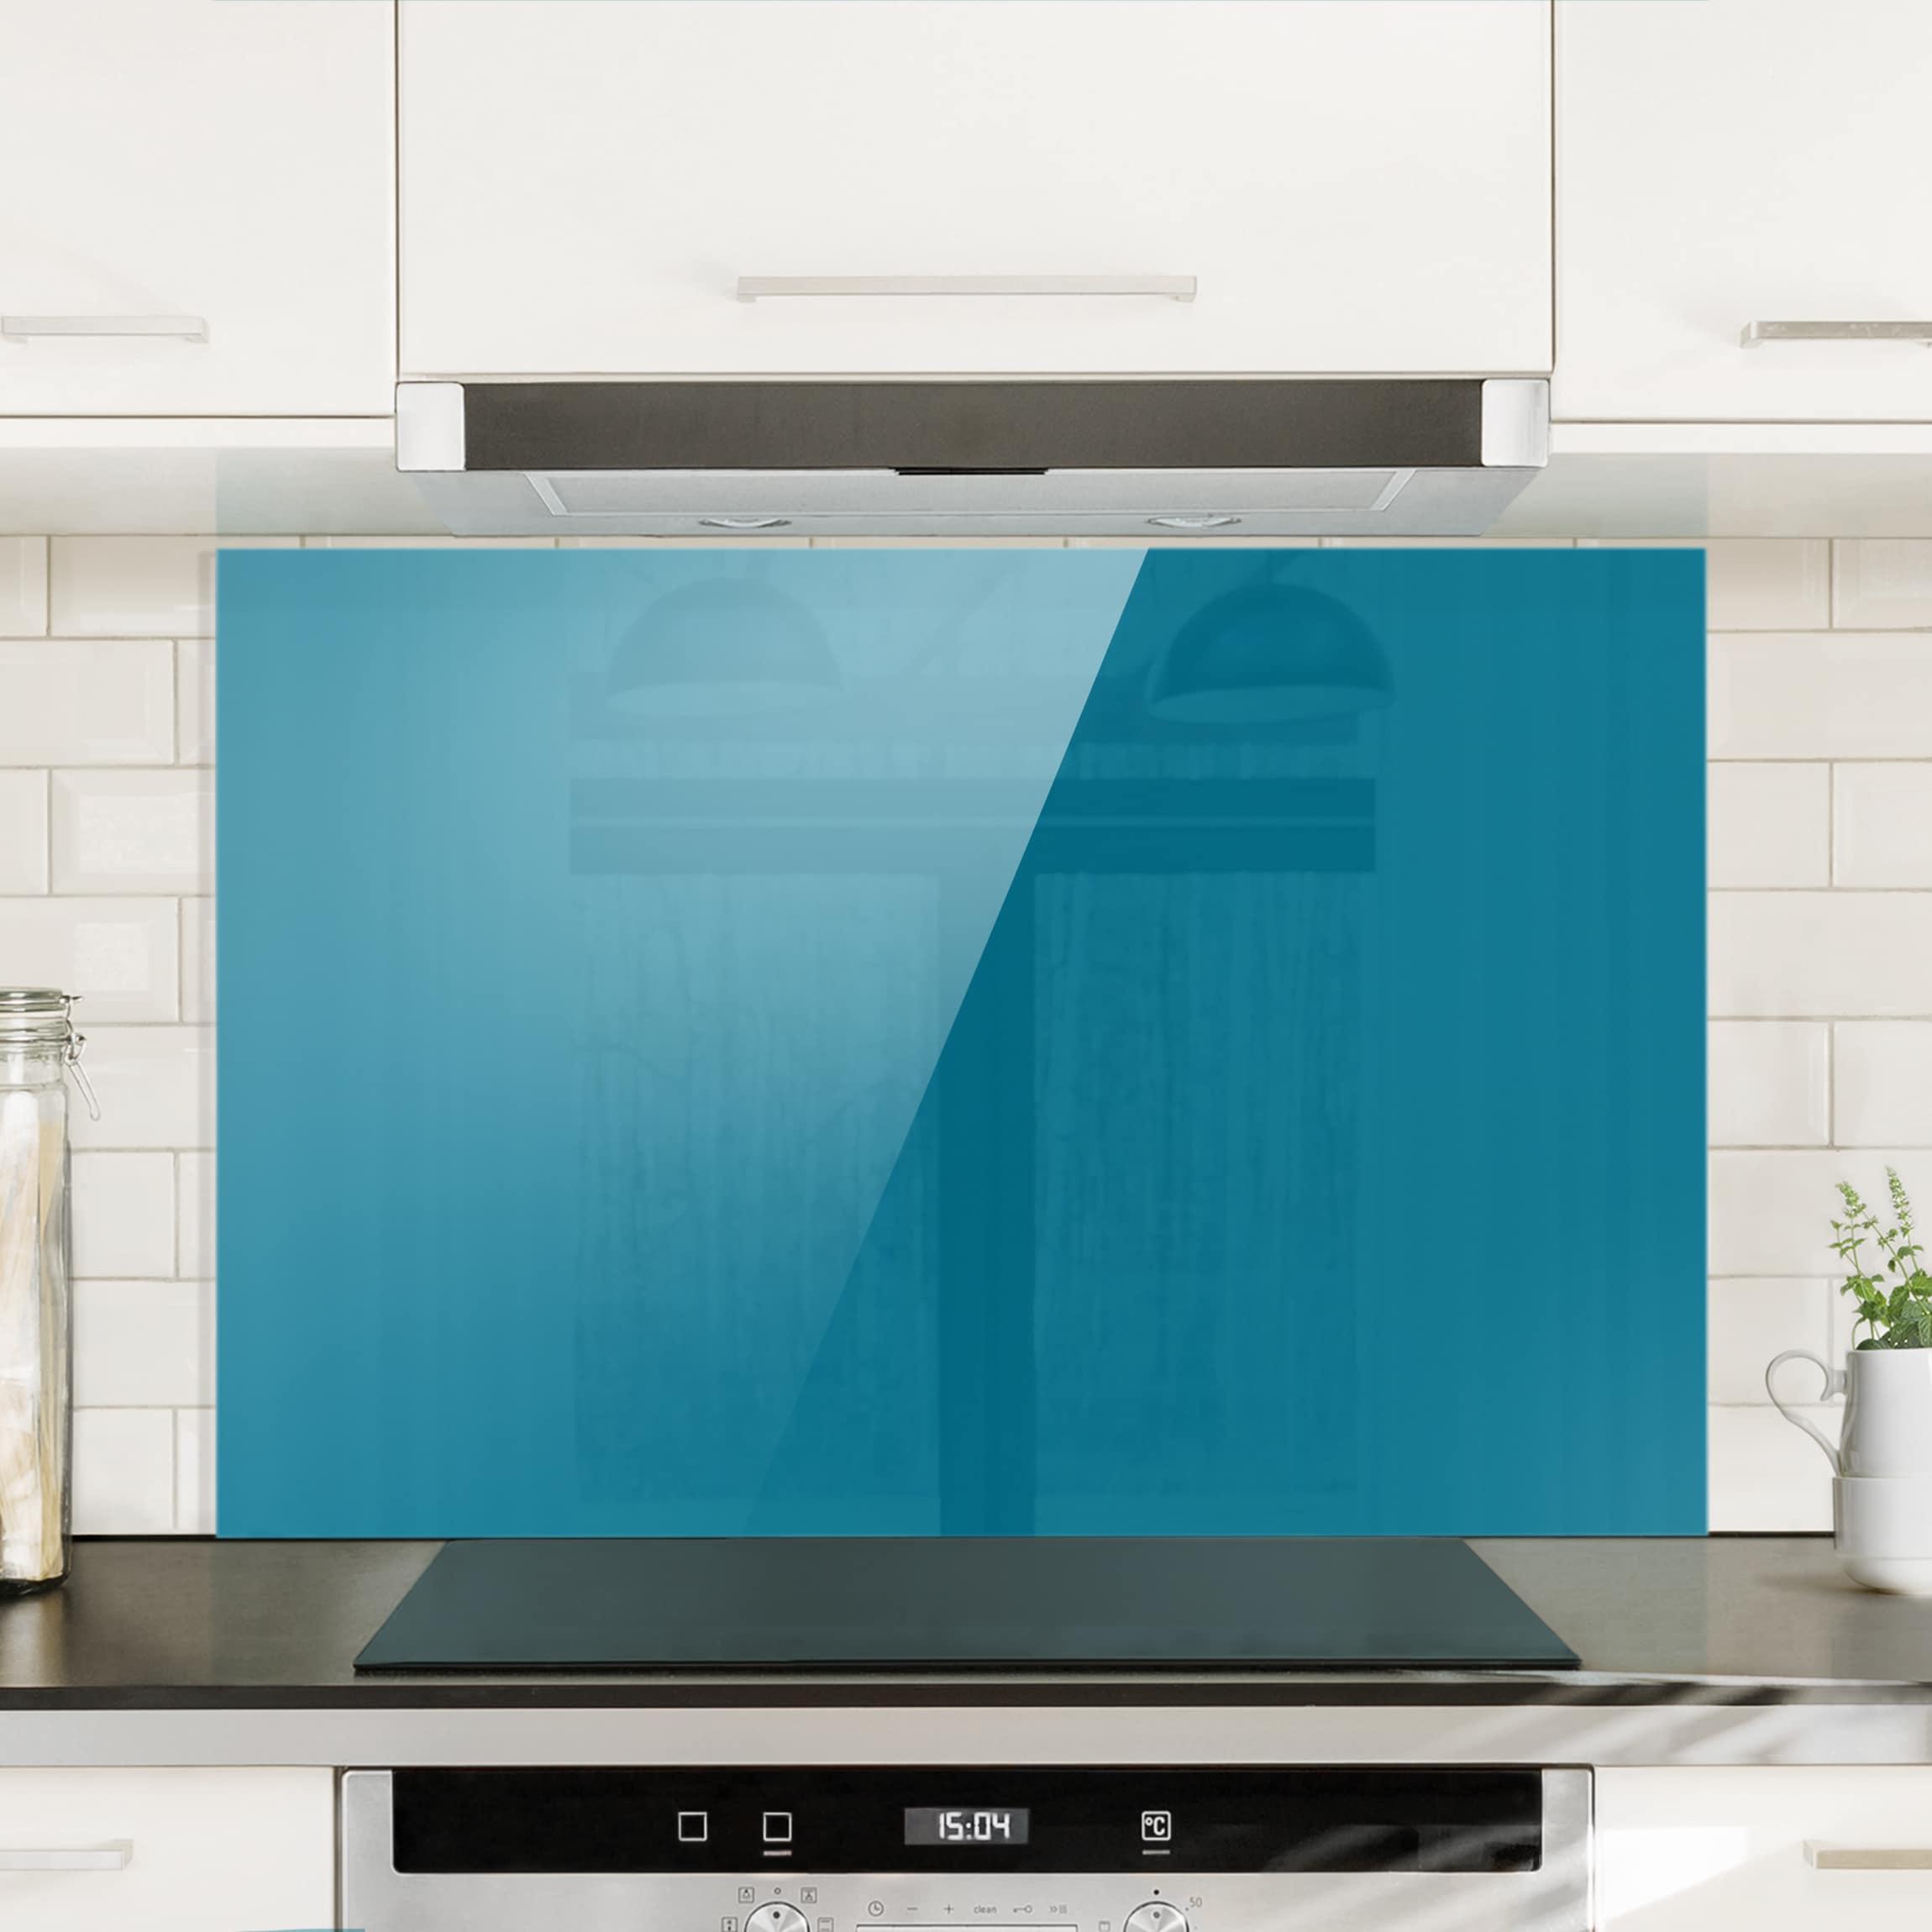 spritzschutz glas petrol quer 2 3. Black Bedroom Furniture Sets. Home Design Ideas